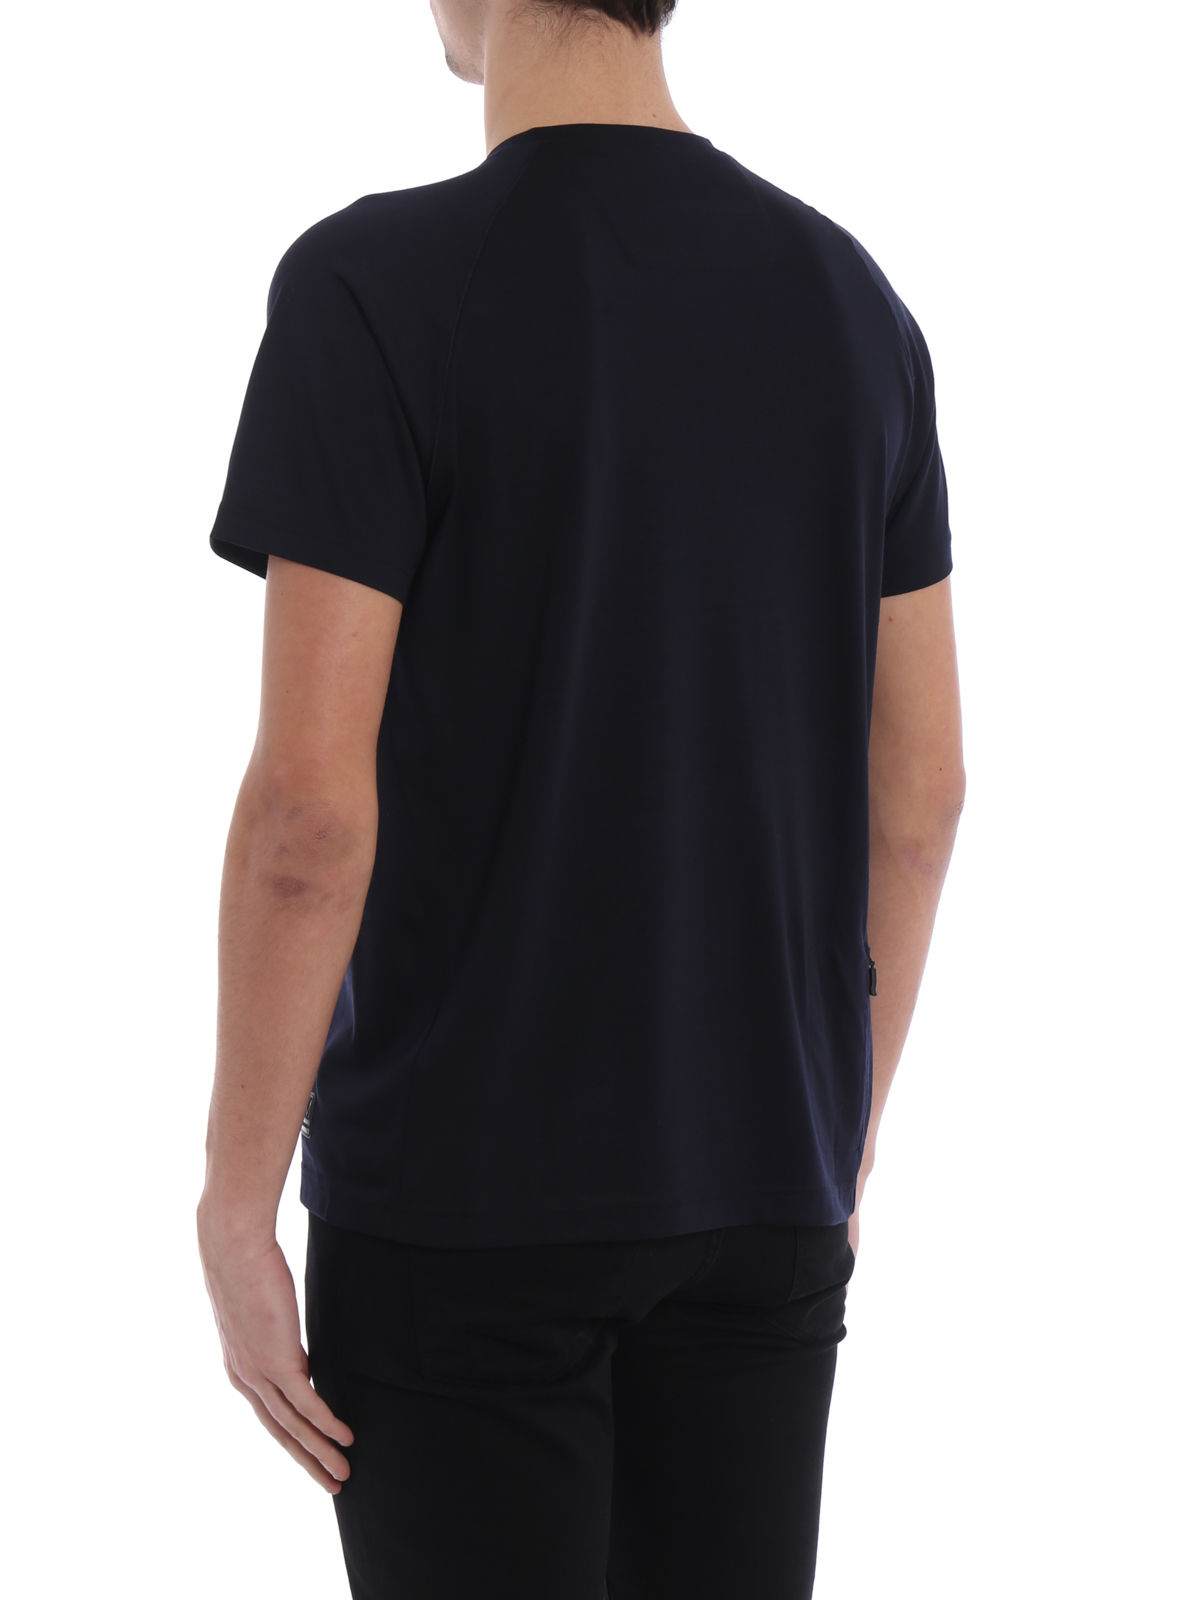 Dark blue wool jersey t shirt by z zegna t shirts ikrix for T shirt dark blue